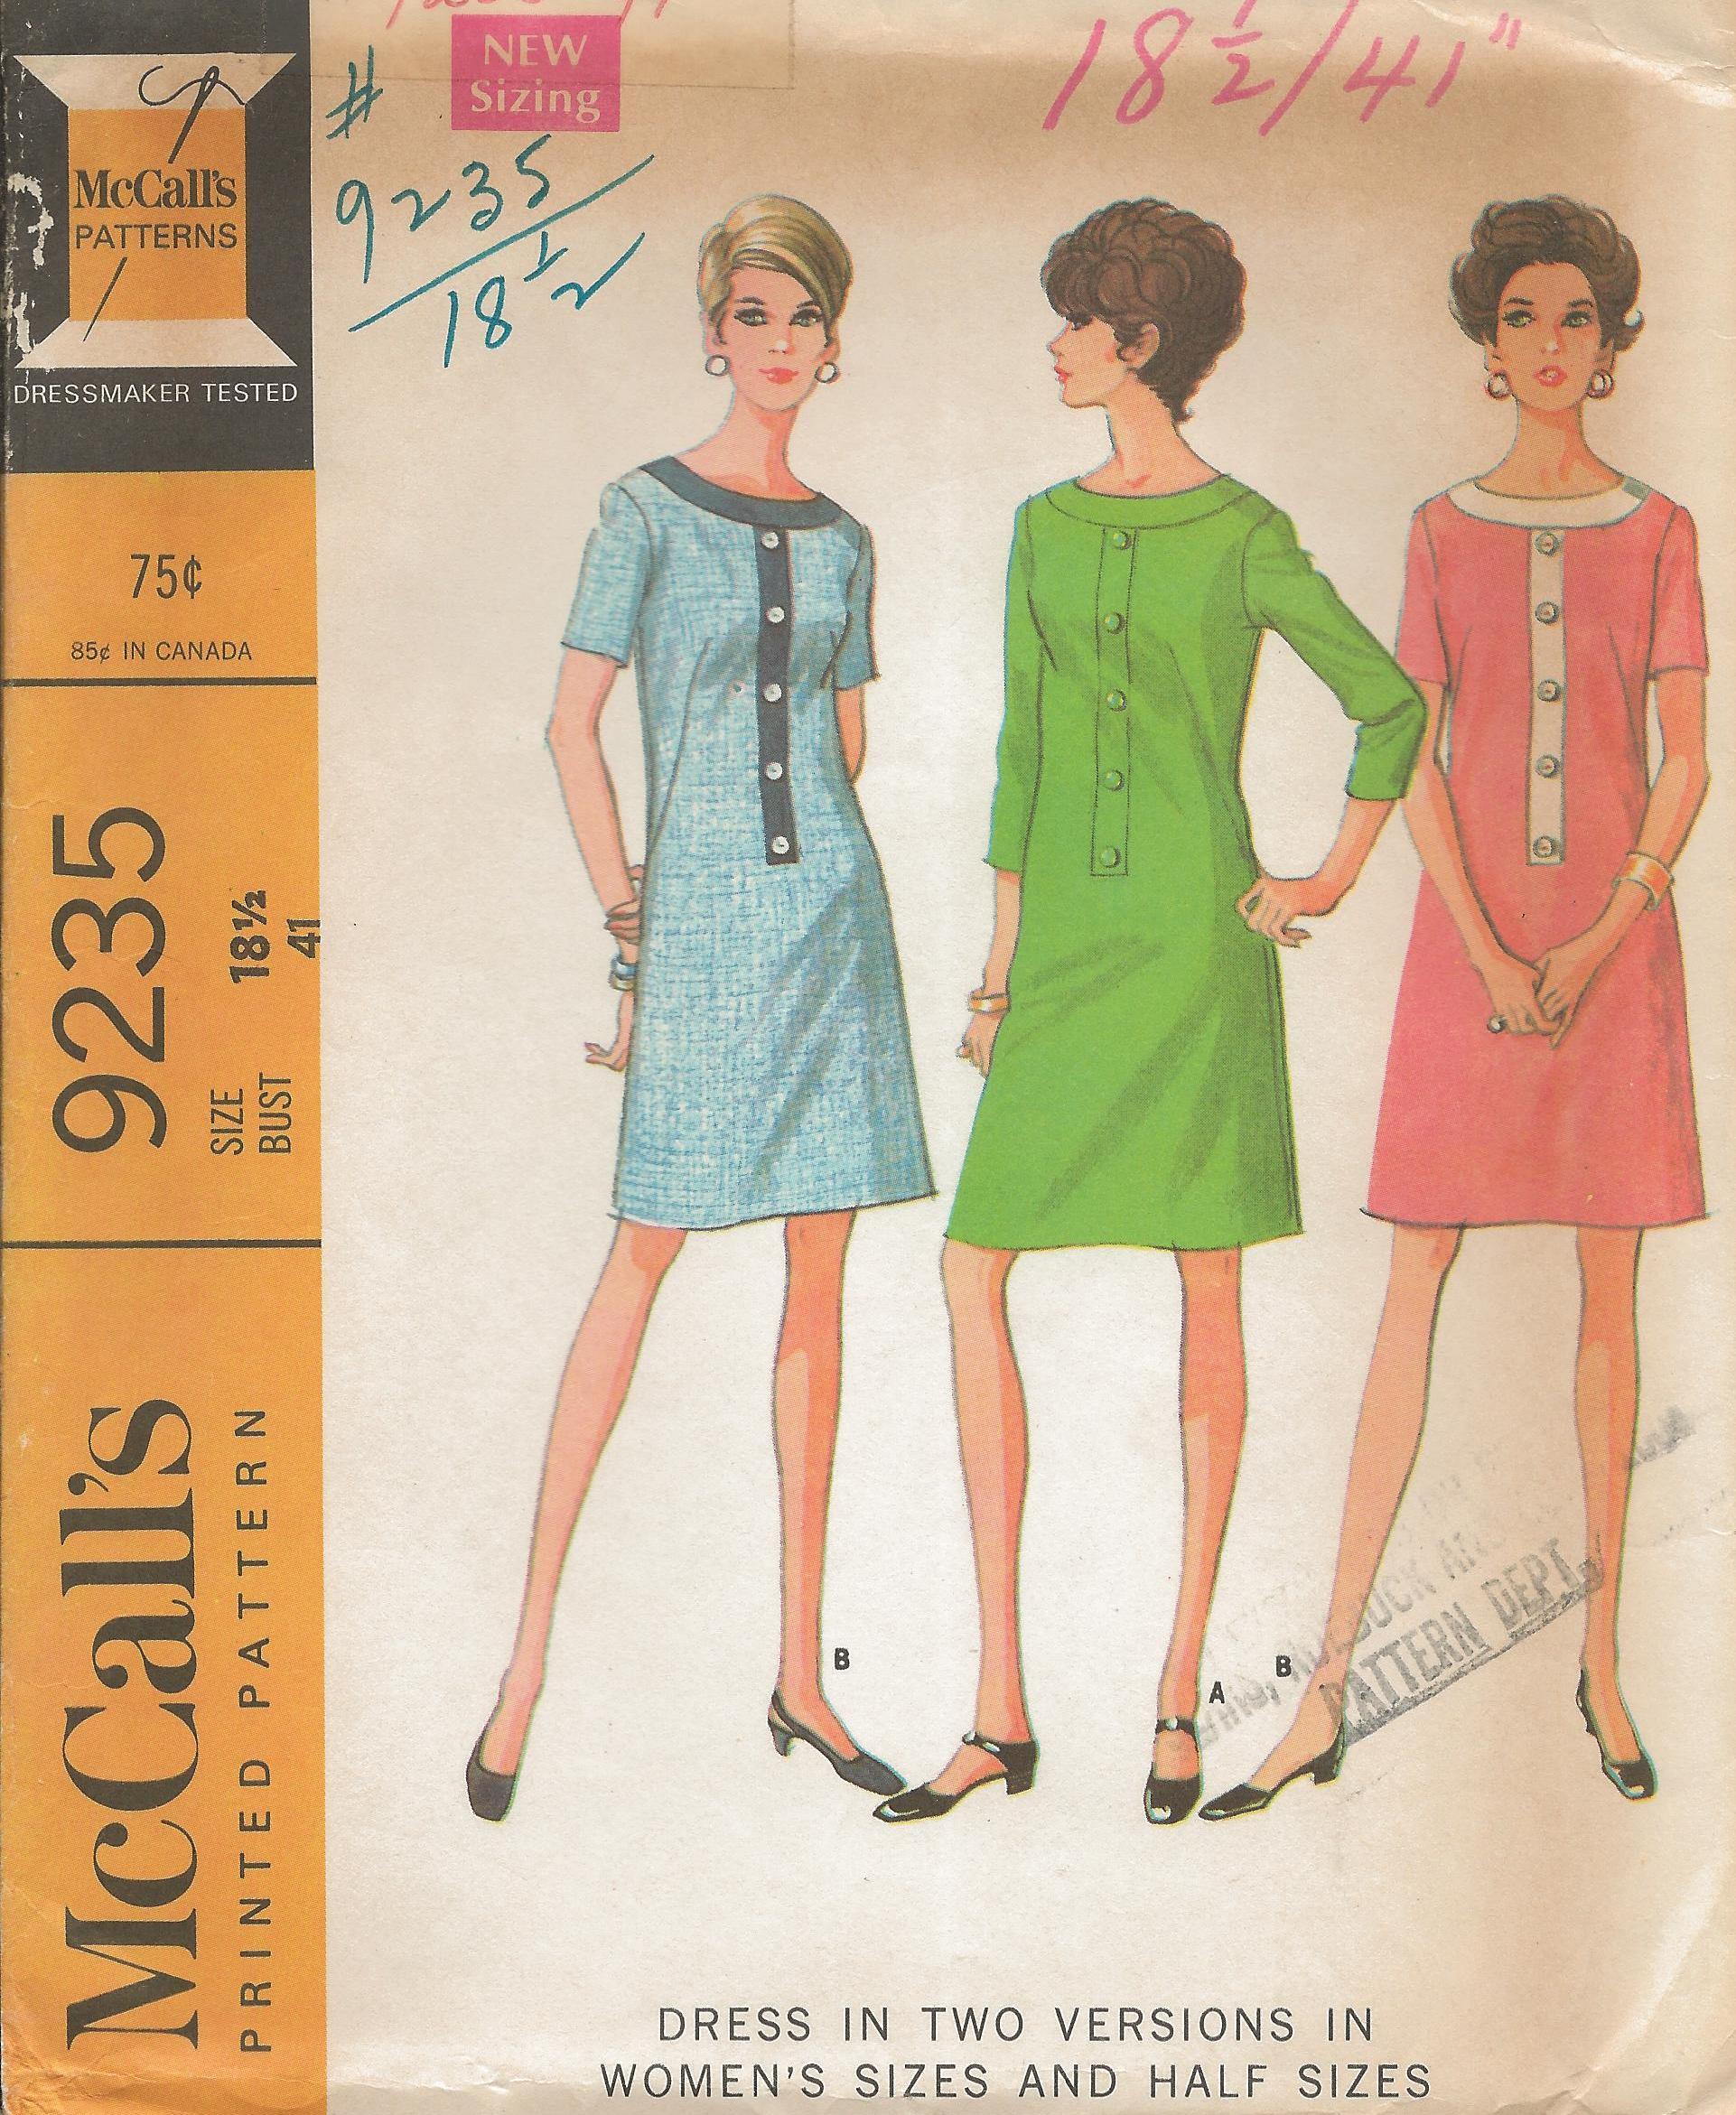 McCall's 9235